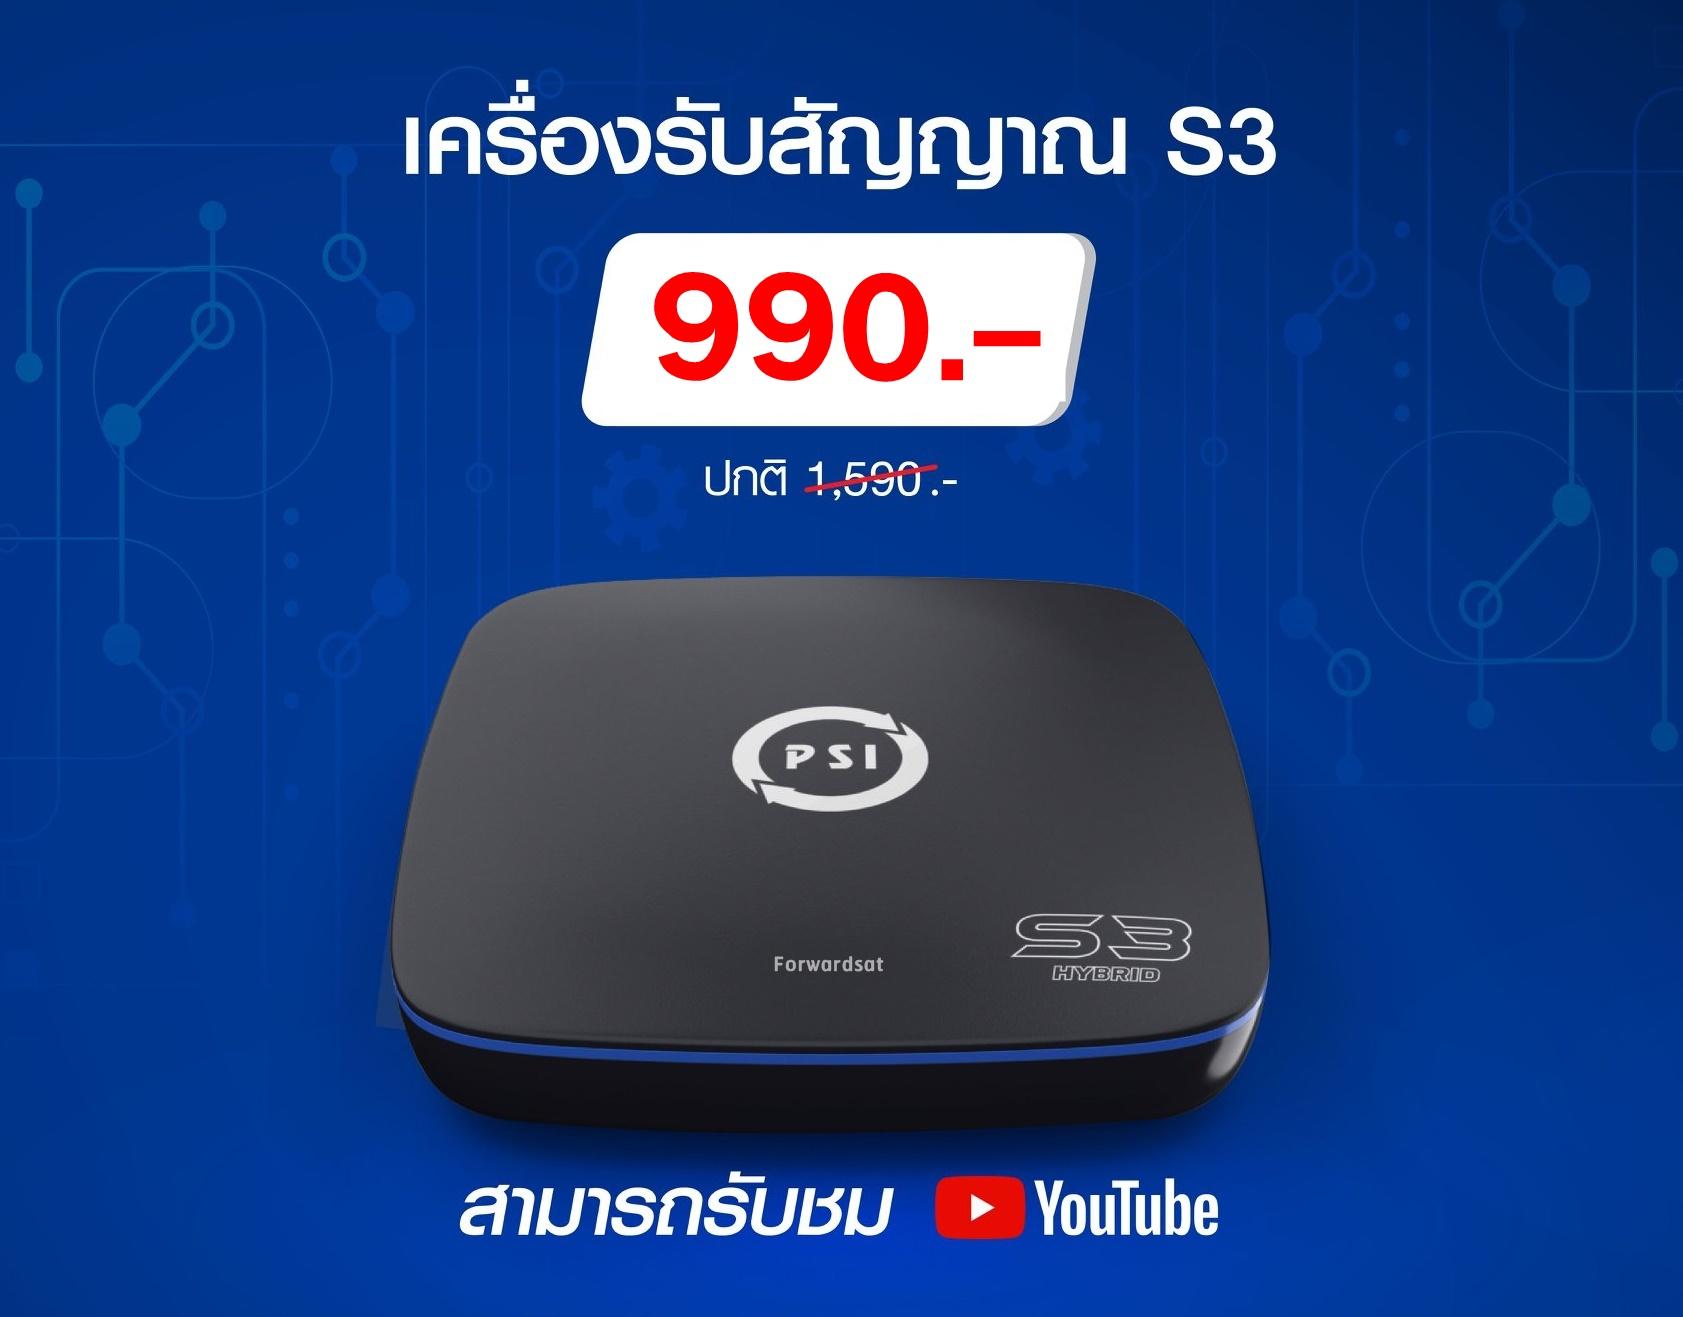 PSI O5 กล่องรับสัญญาณอินเตอร์เน็ตทีวี Smart Box, Android Box